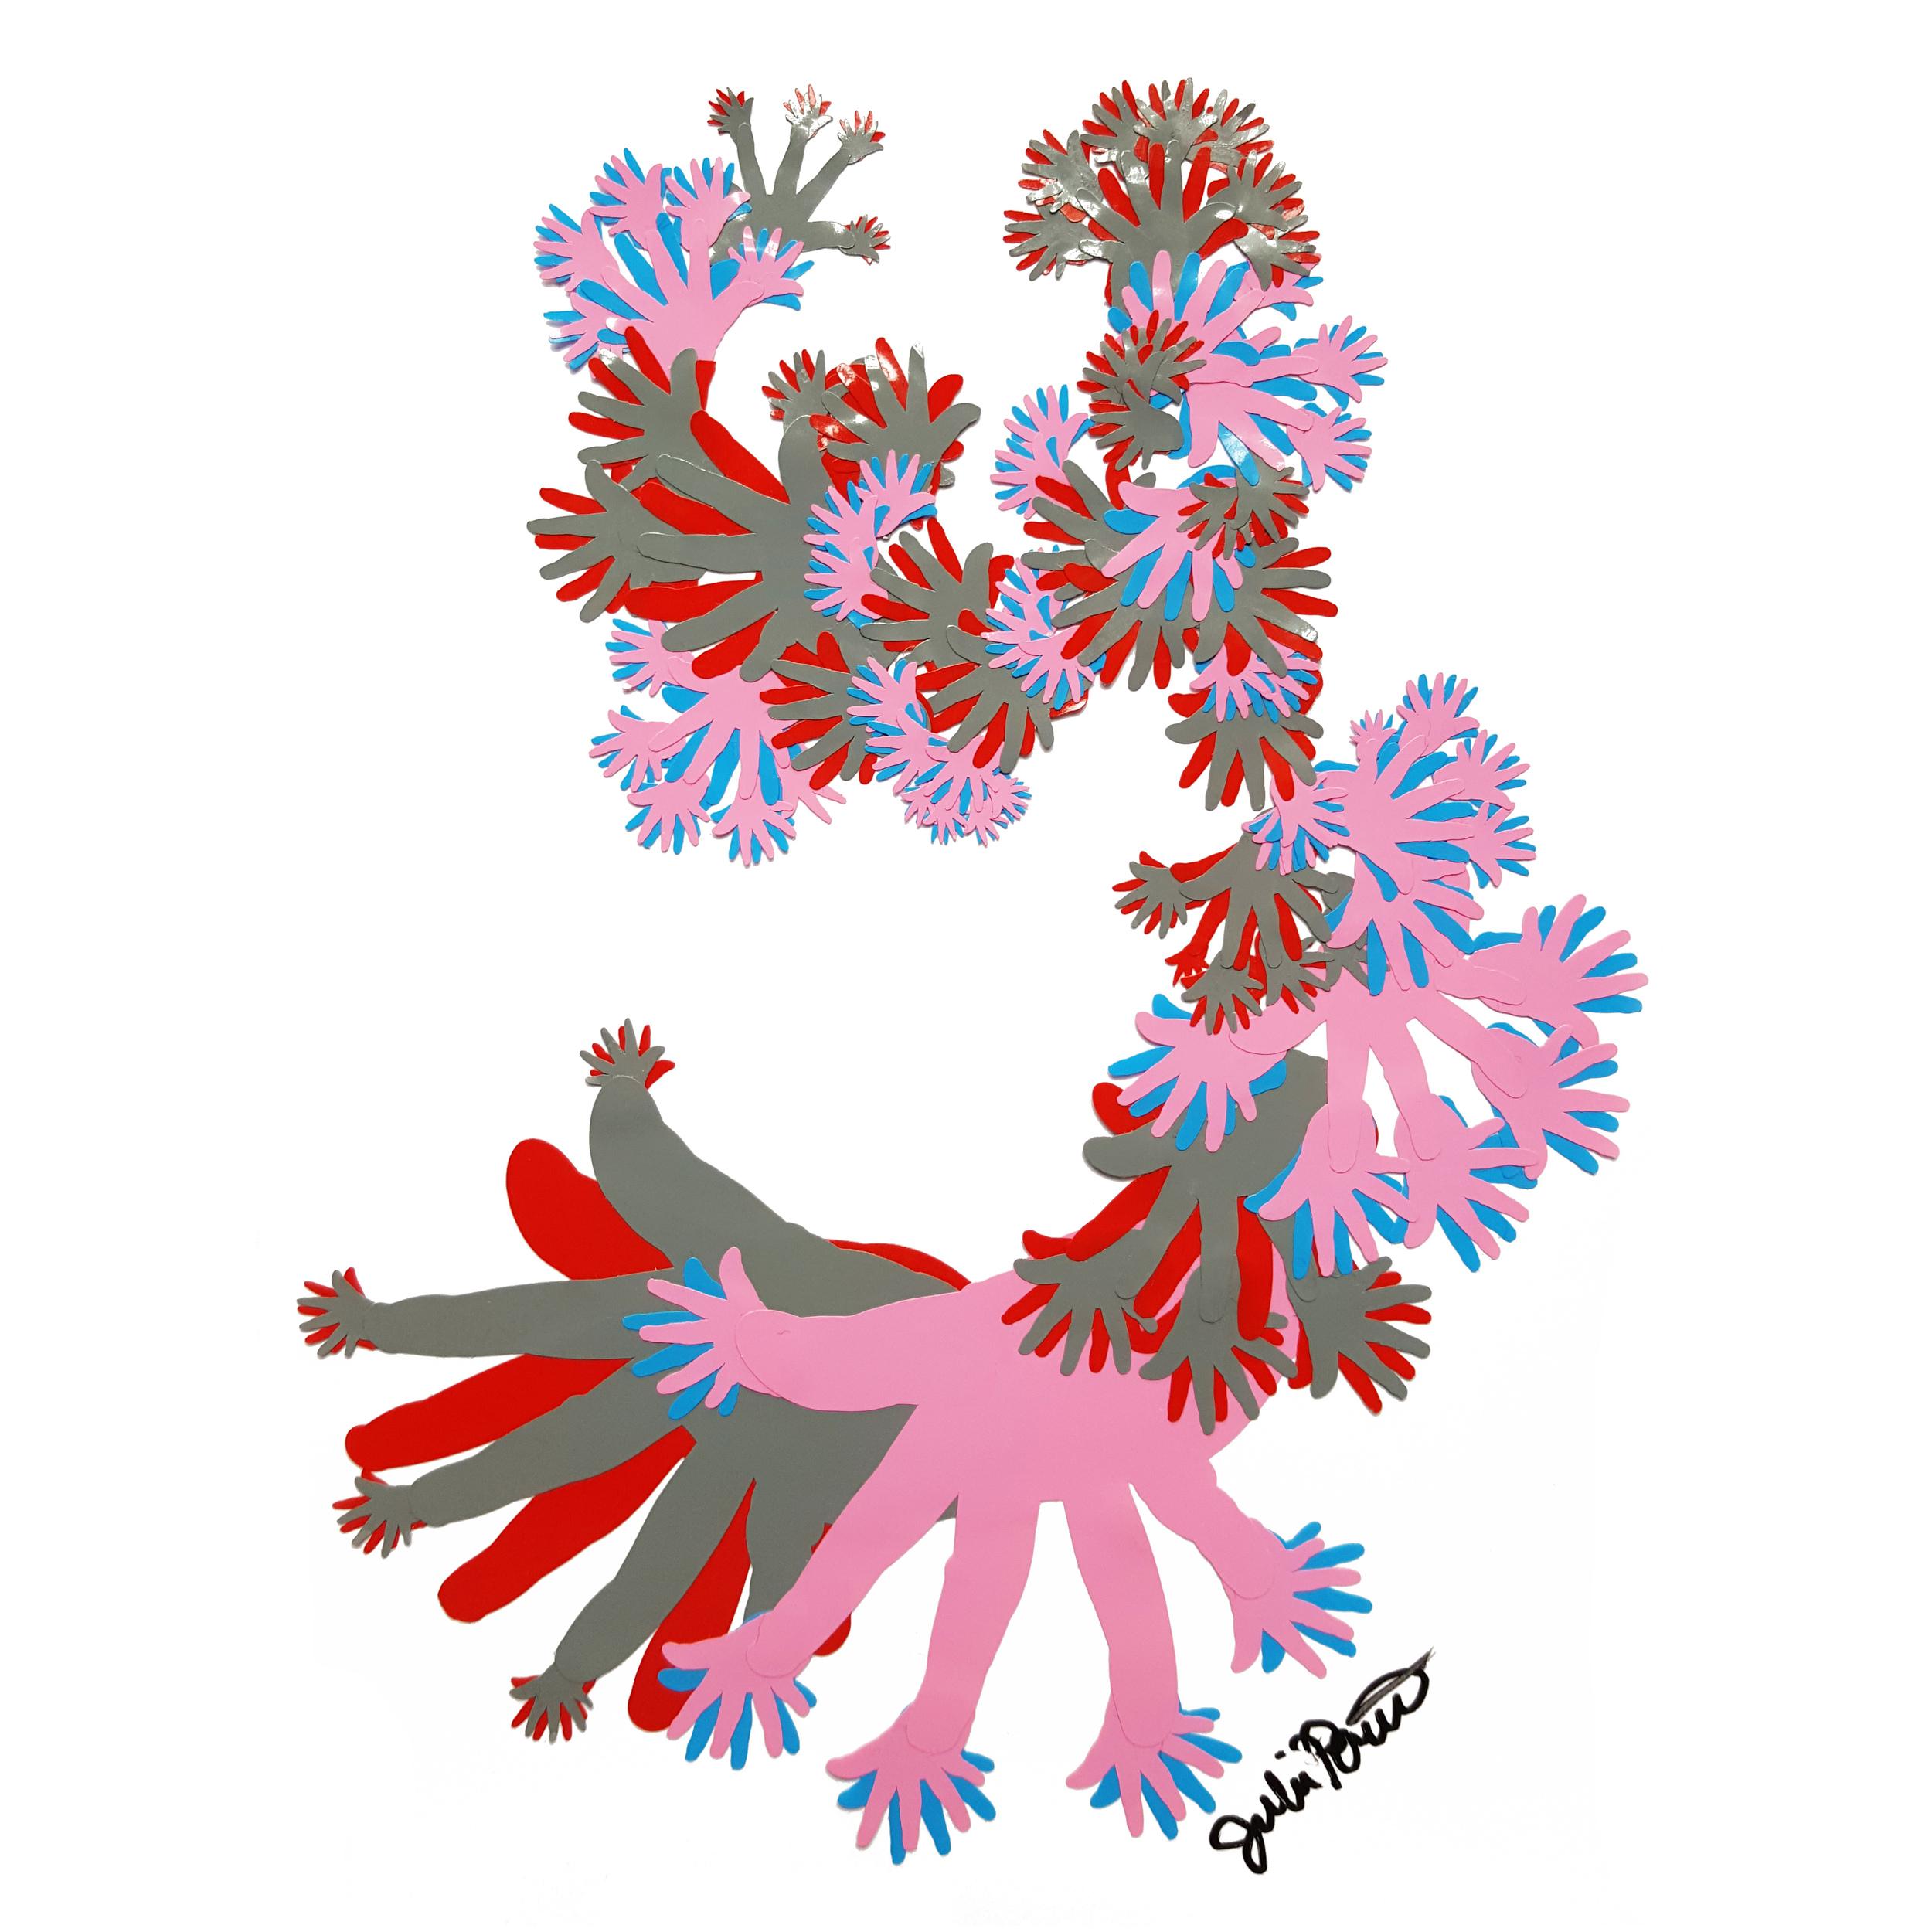 Flamenco Jazzhands  apx 18x13cm